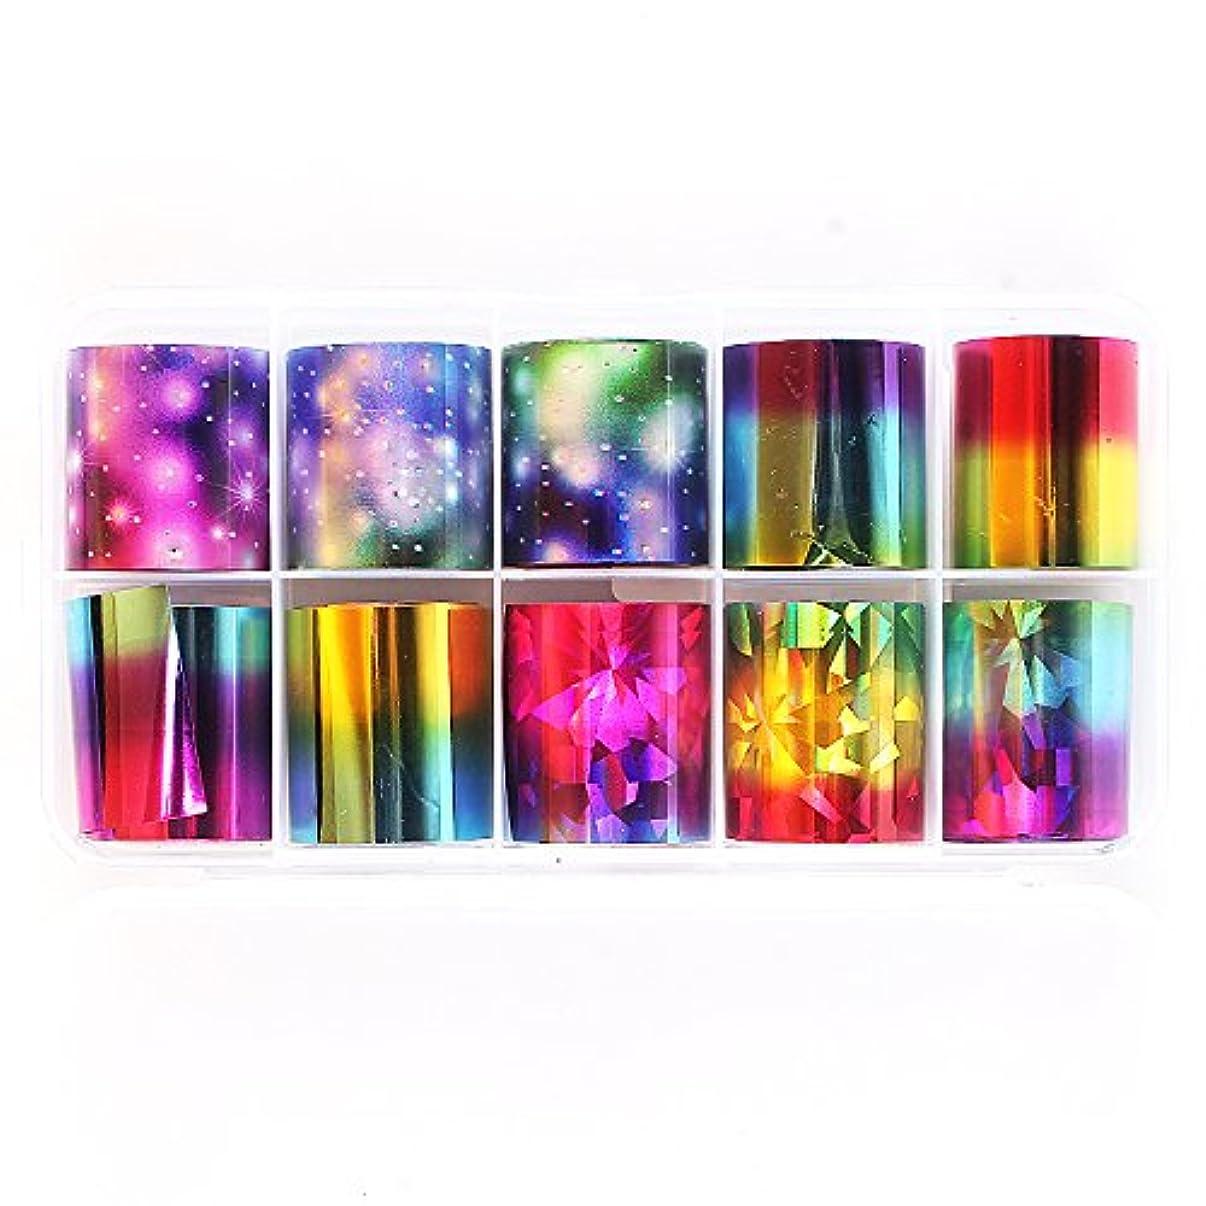 SUKTI&XIAO ネイルステッカー 12枚/箱カラフルな星空ネイル箔Diyクラフト接着剤接着剤アート箔マニキュア装飾用ネイルステッカー紙